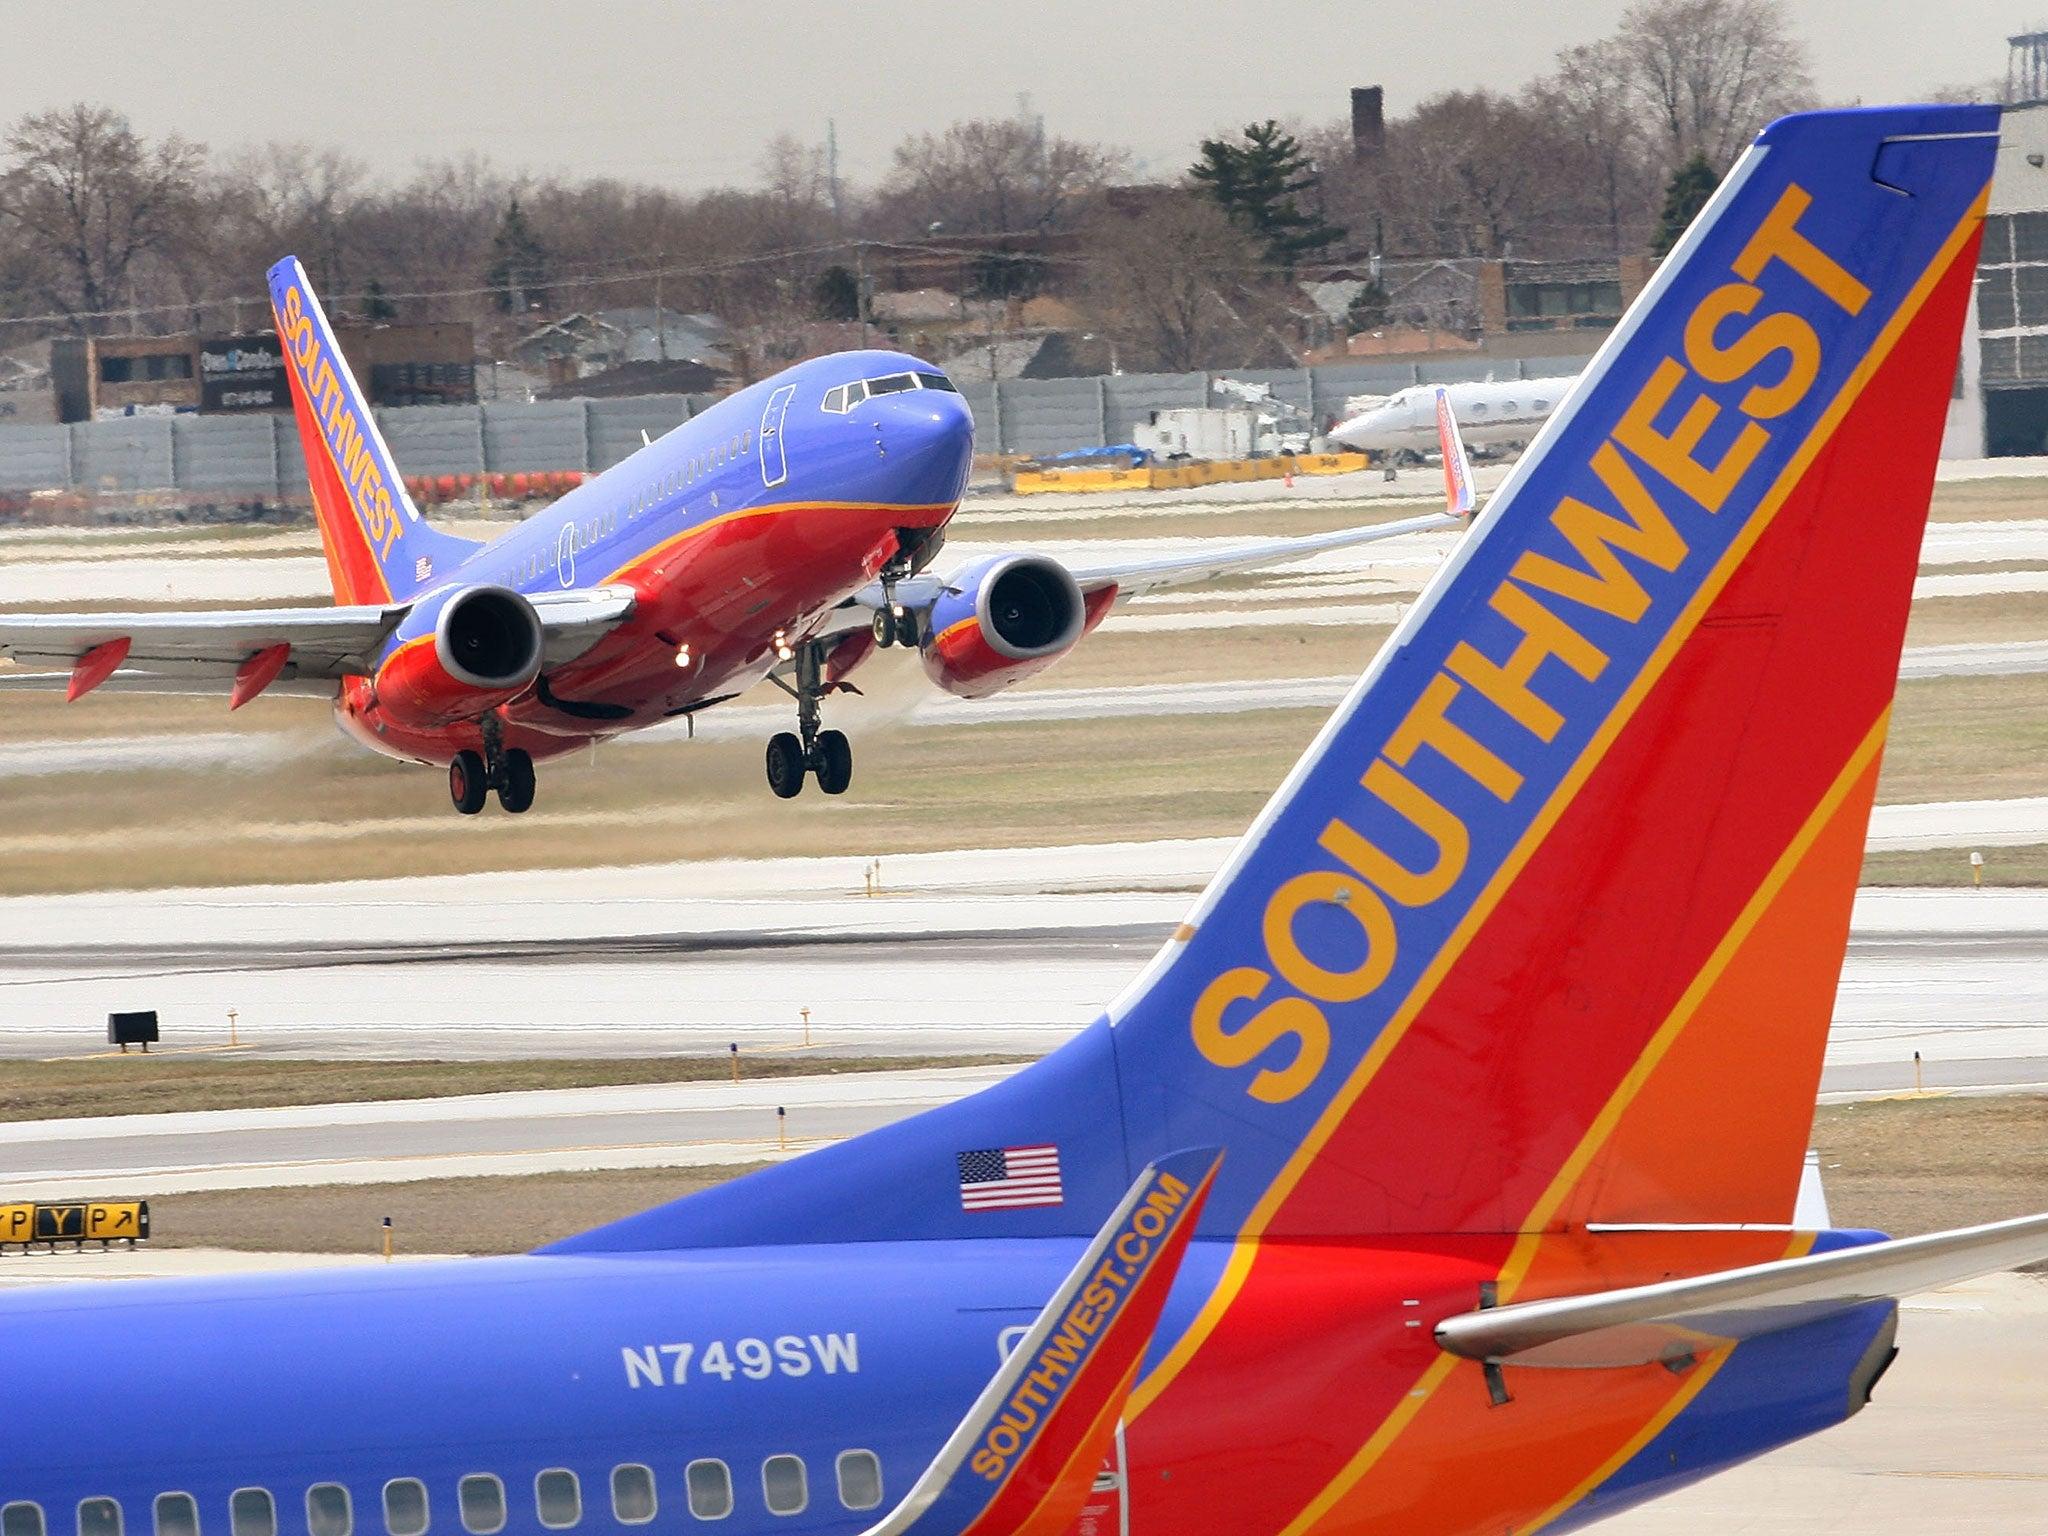 Emotional support dog bites child's face on Southwest Airlines flight